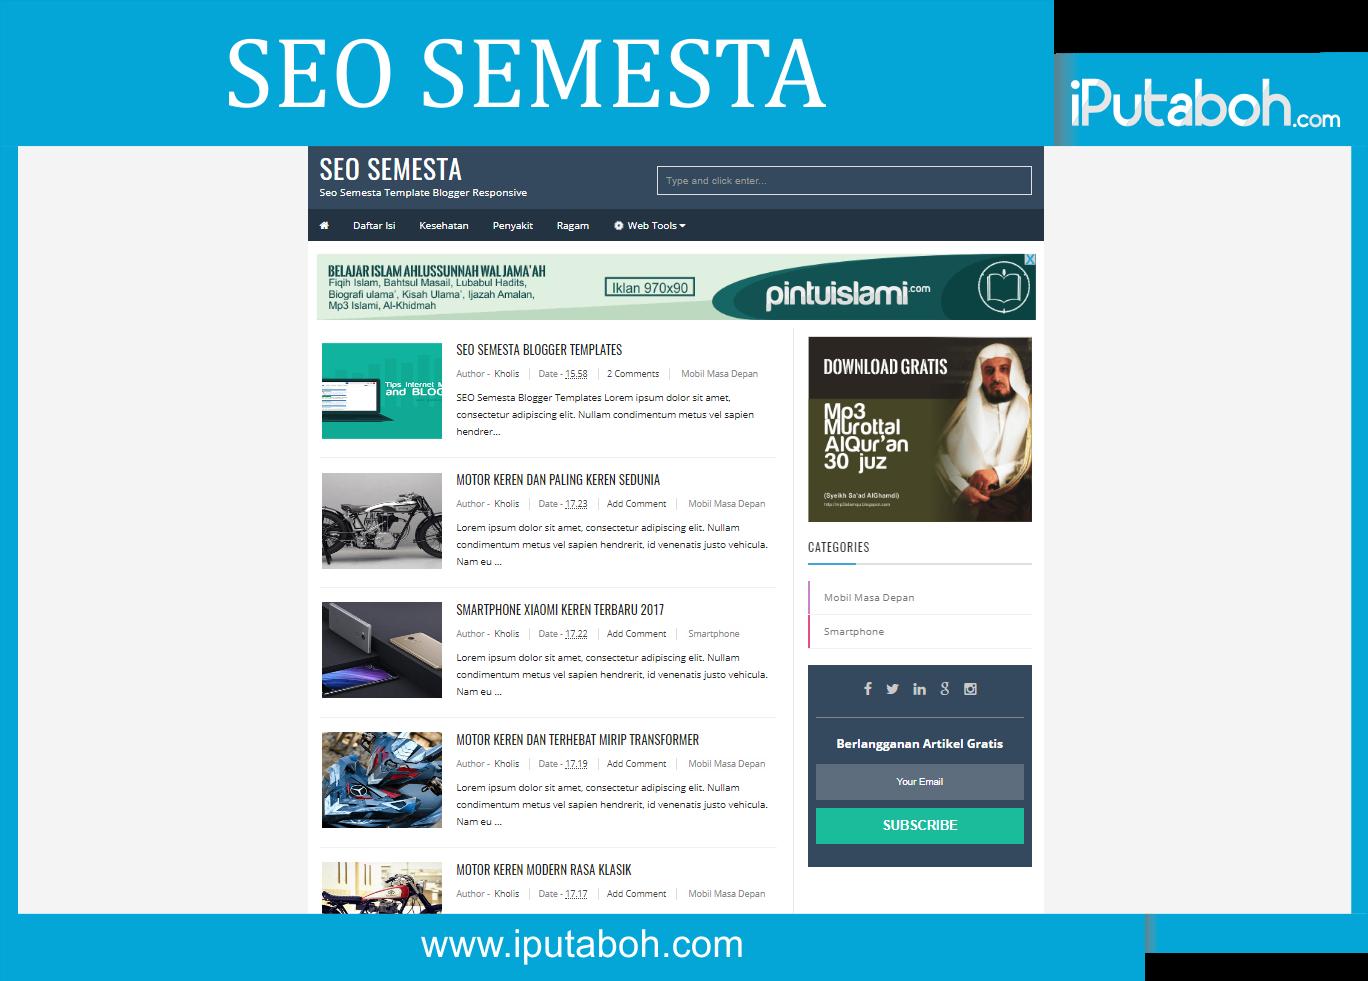 SEO Semesta Free Blogger Templates - iPutaboh : Blogger Templates